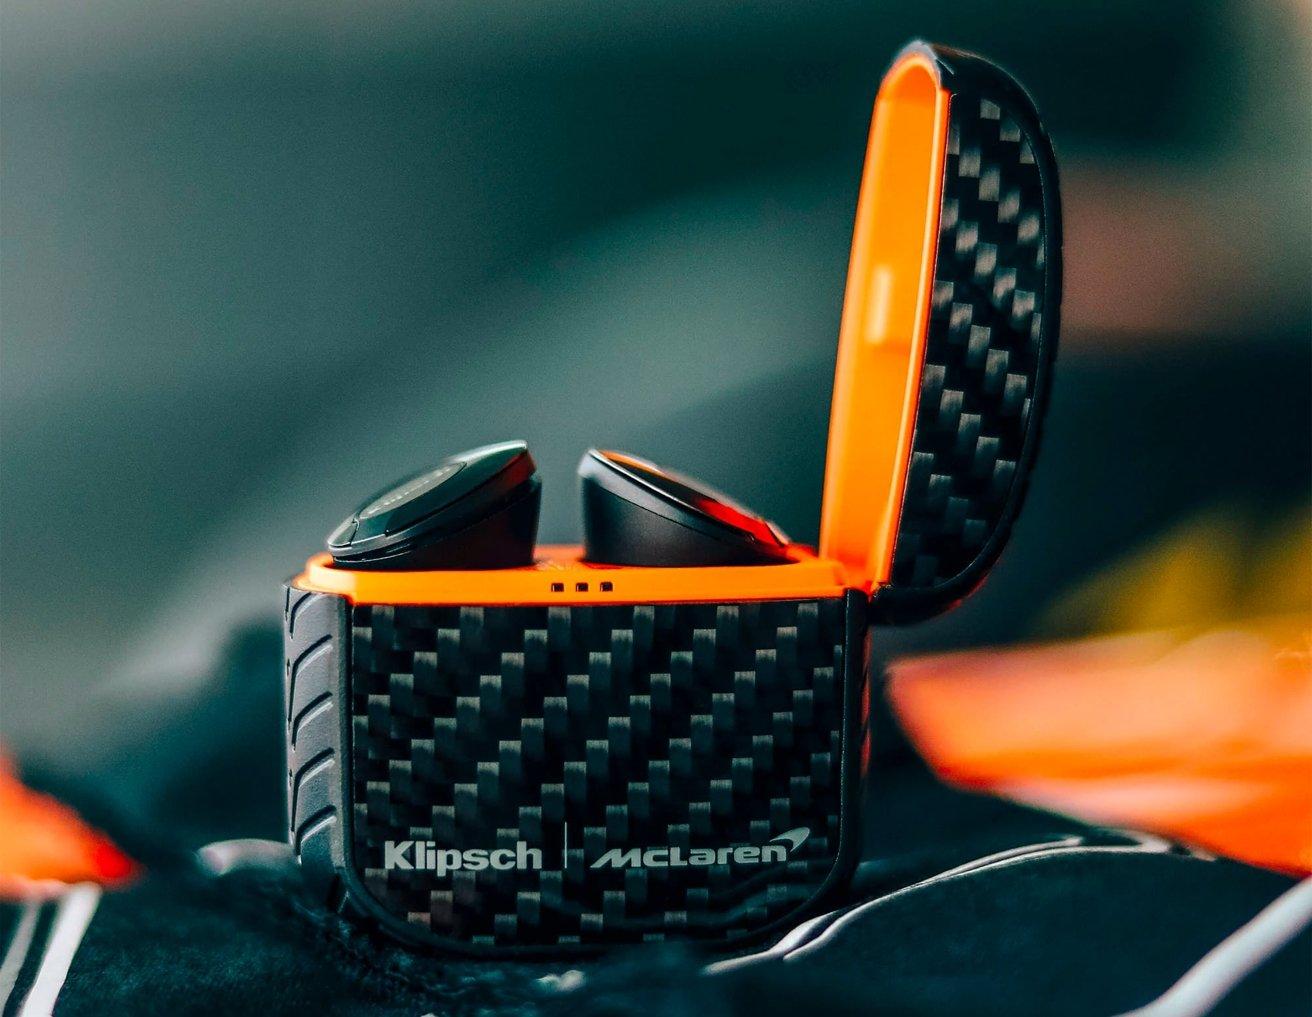 The Klipsch T5 II ANC McLaren Edition looks cool, but it's $349.